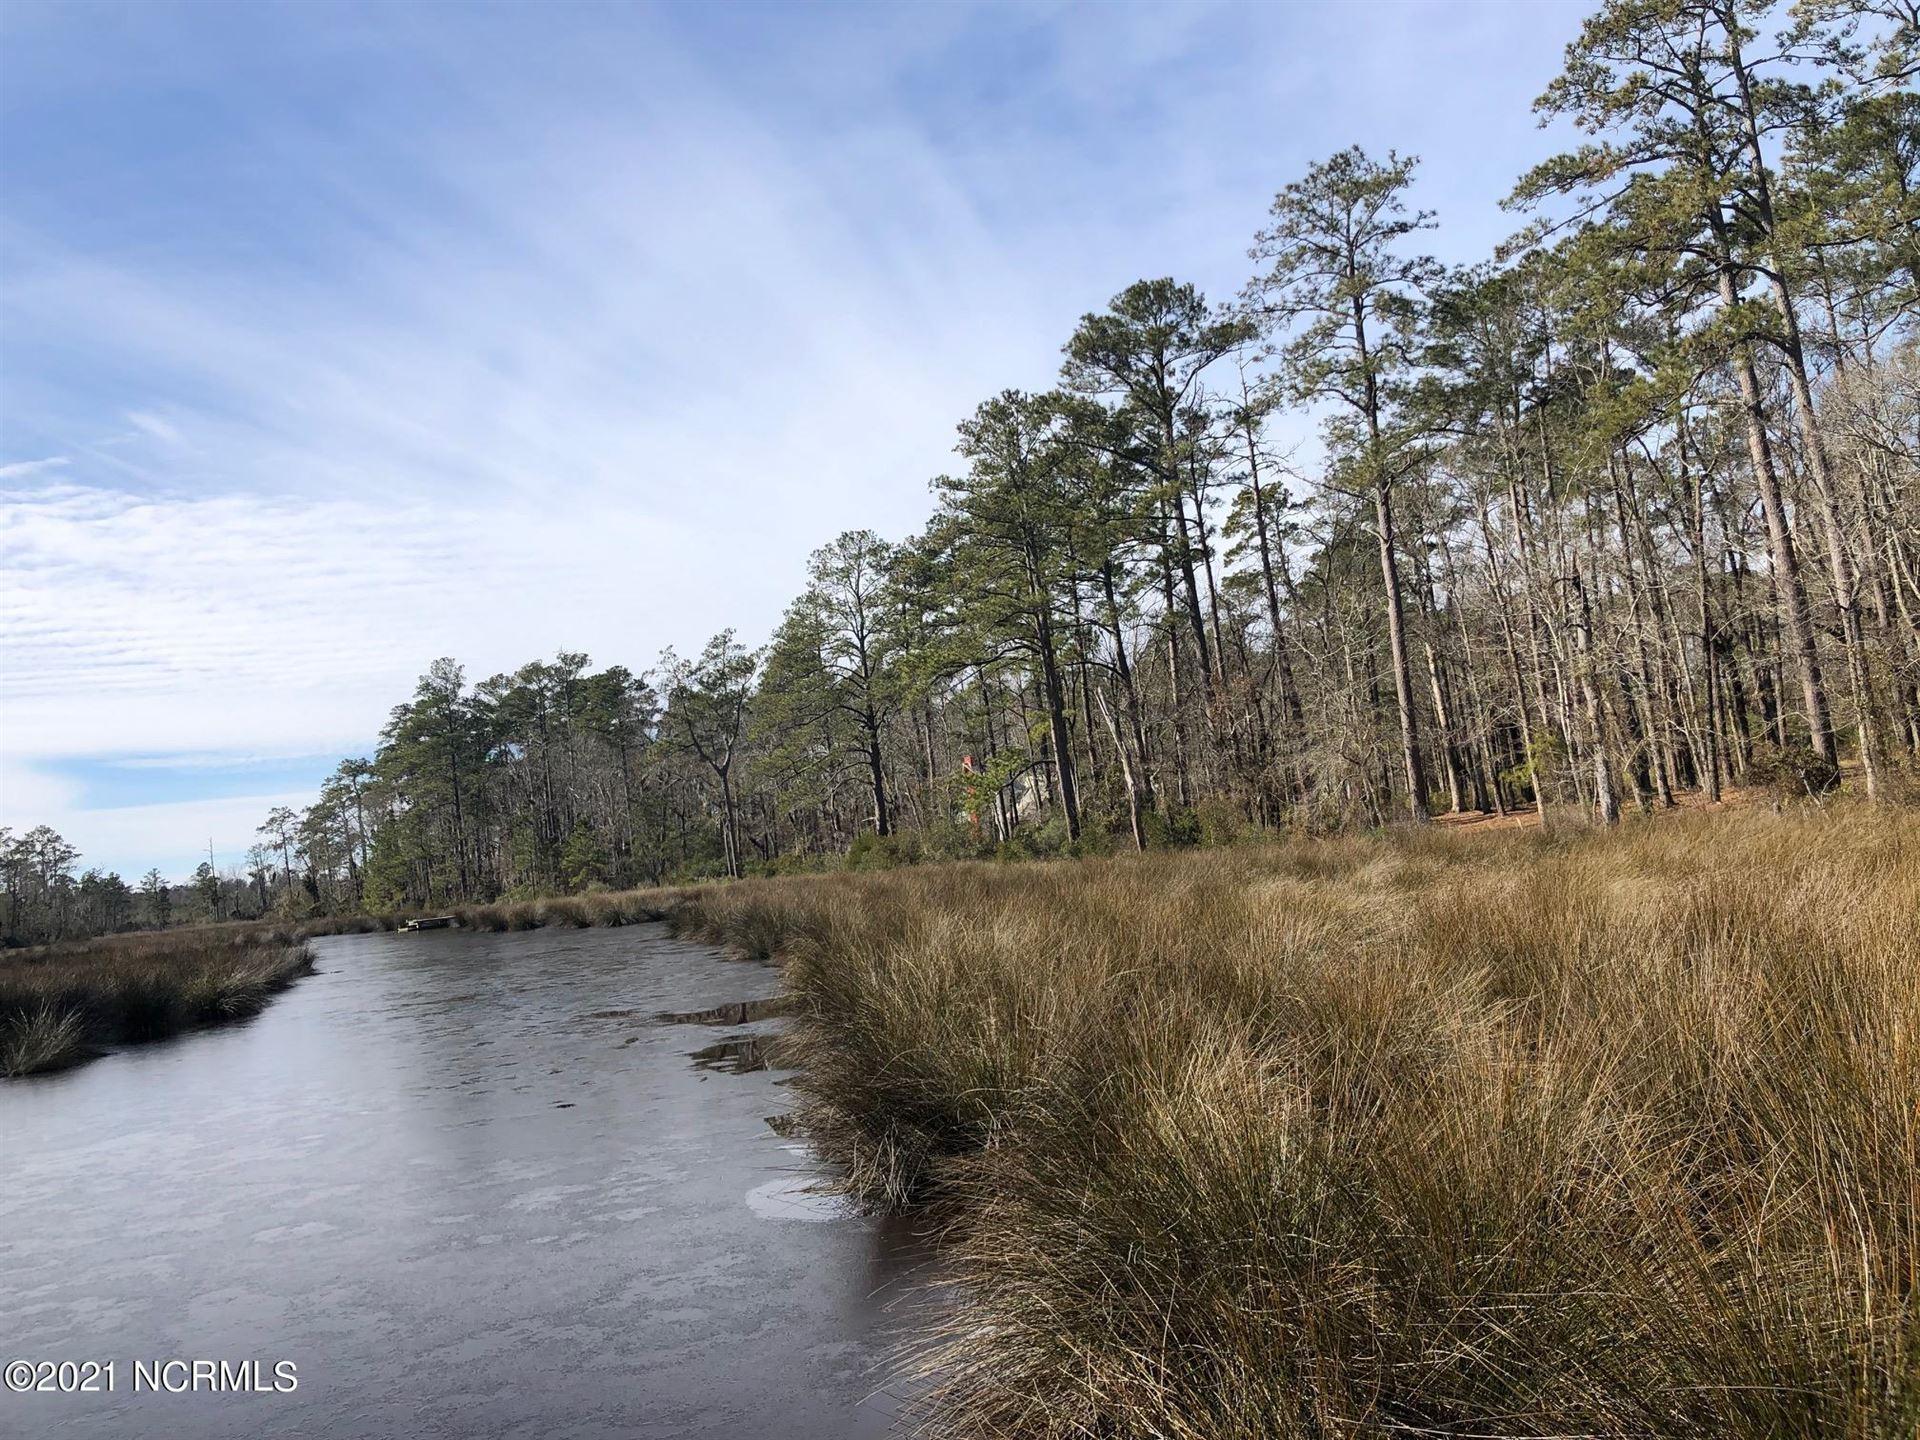 Photo of Lot 20 N Creek Drive, Belhaven, NC 27810 (MLS # 100254700)